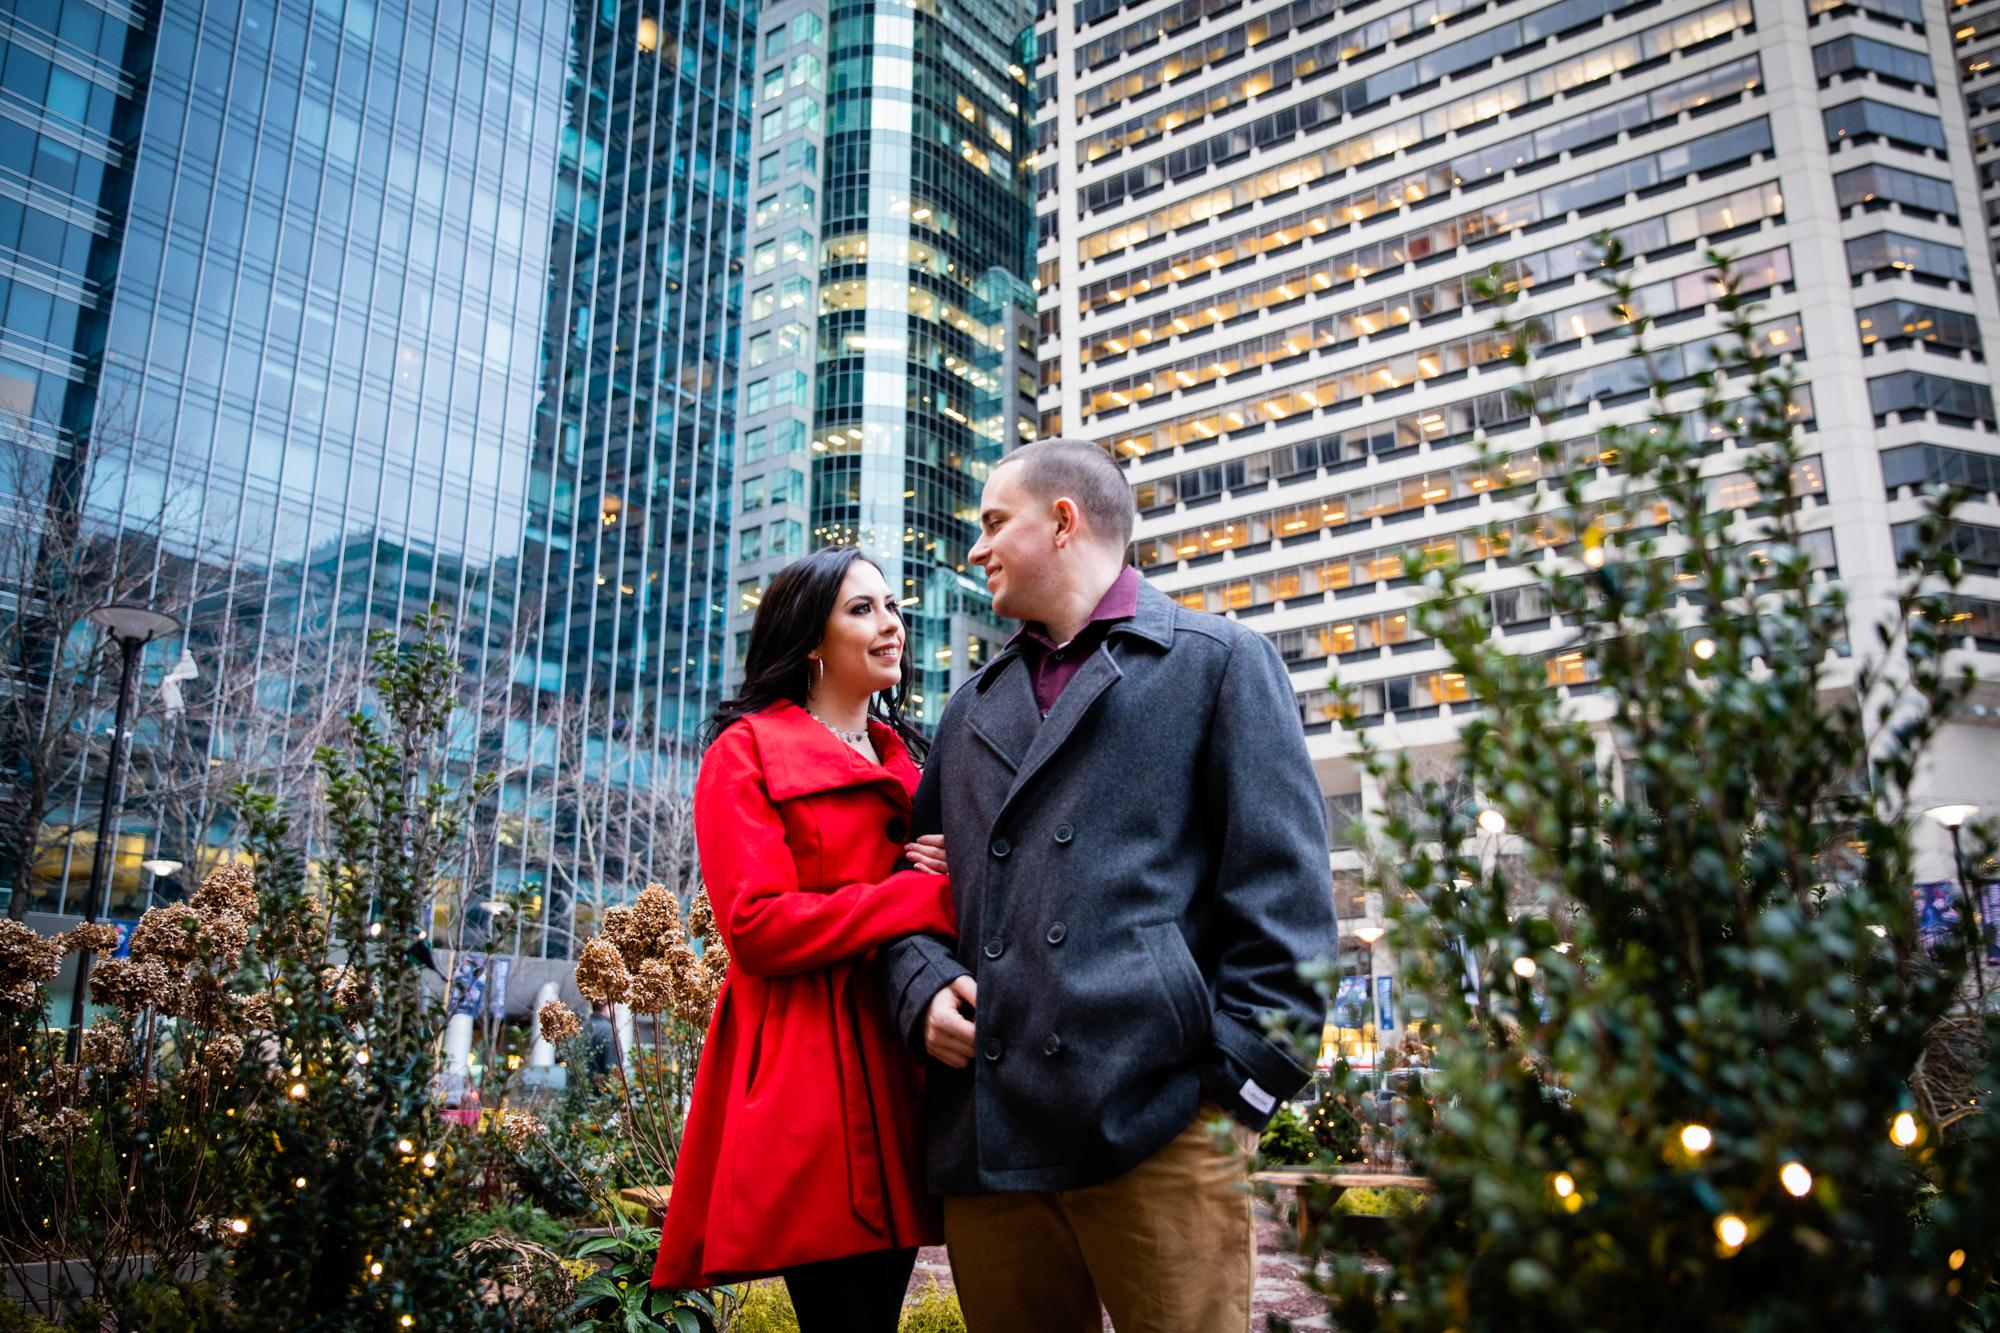 PHILADELPHIA CITY HALL ENGAGEMENT PHOTOS-19.jpg